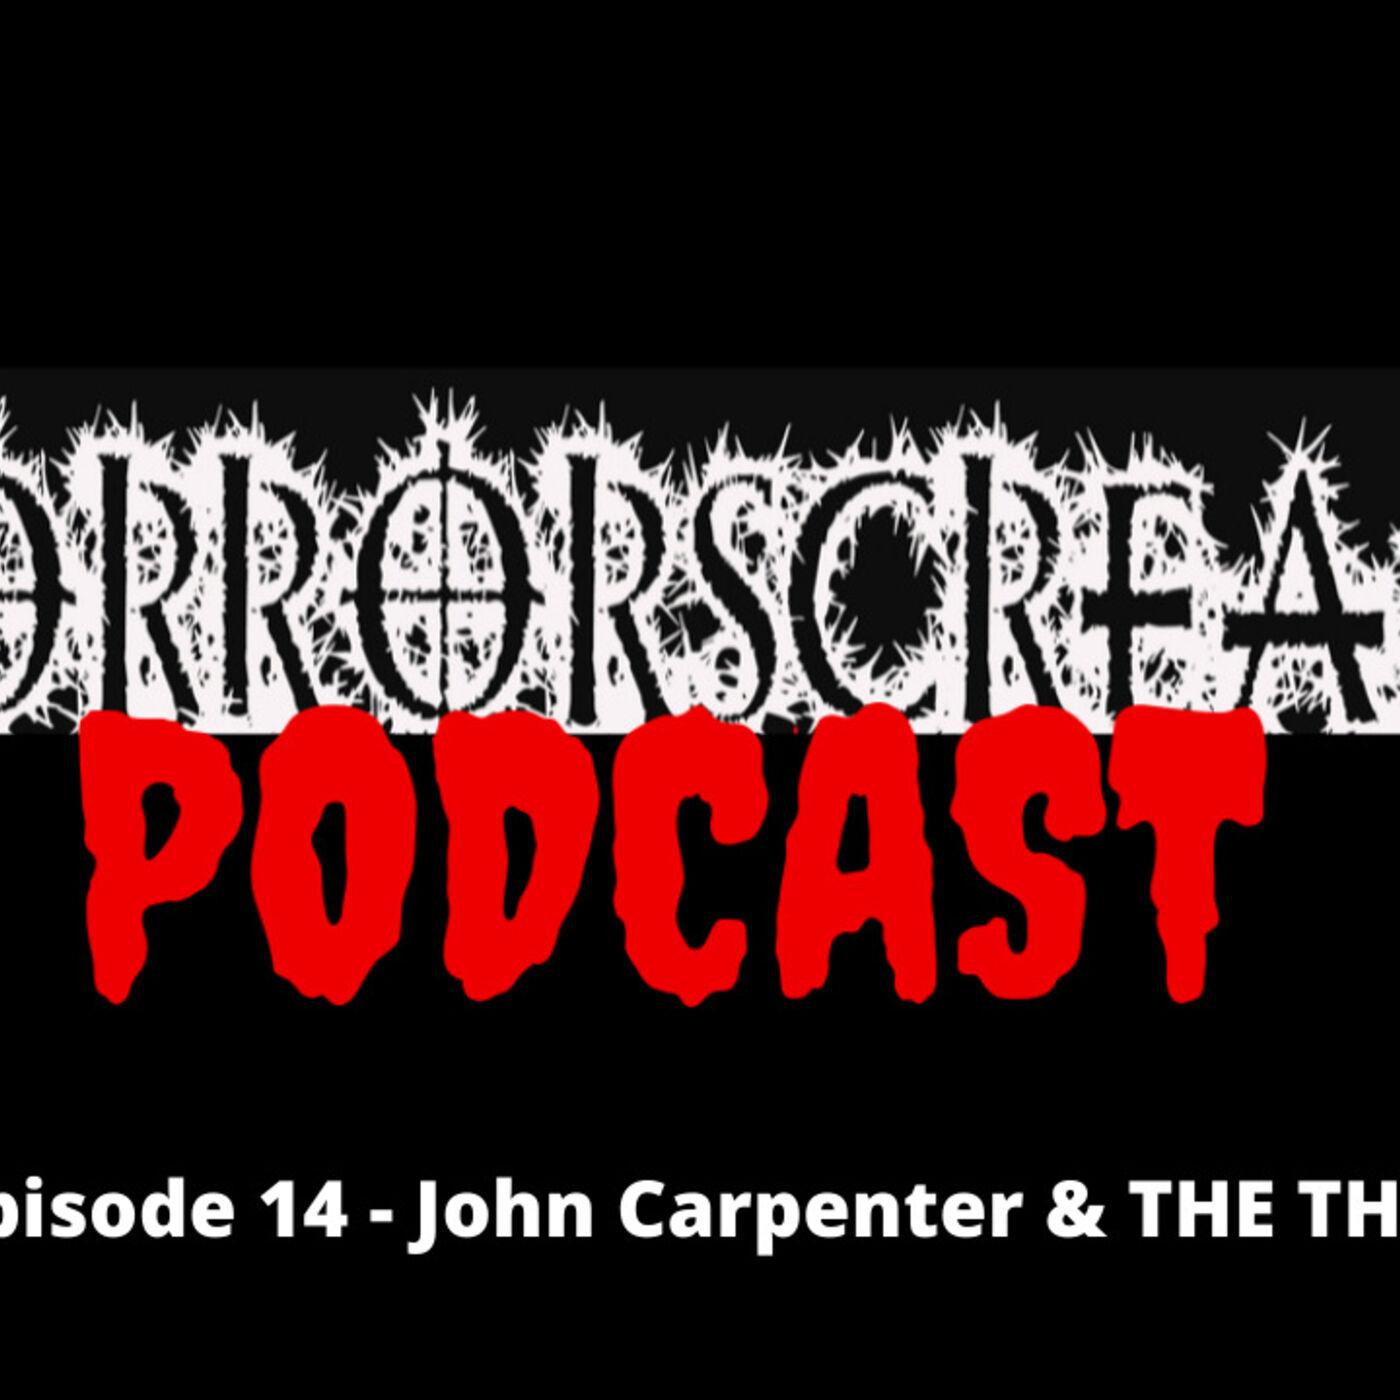 HORRORSCREAMS PODCAST: Episode 14 - John Carpenter & THE THING